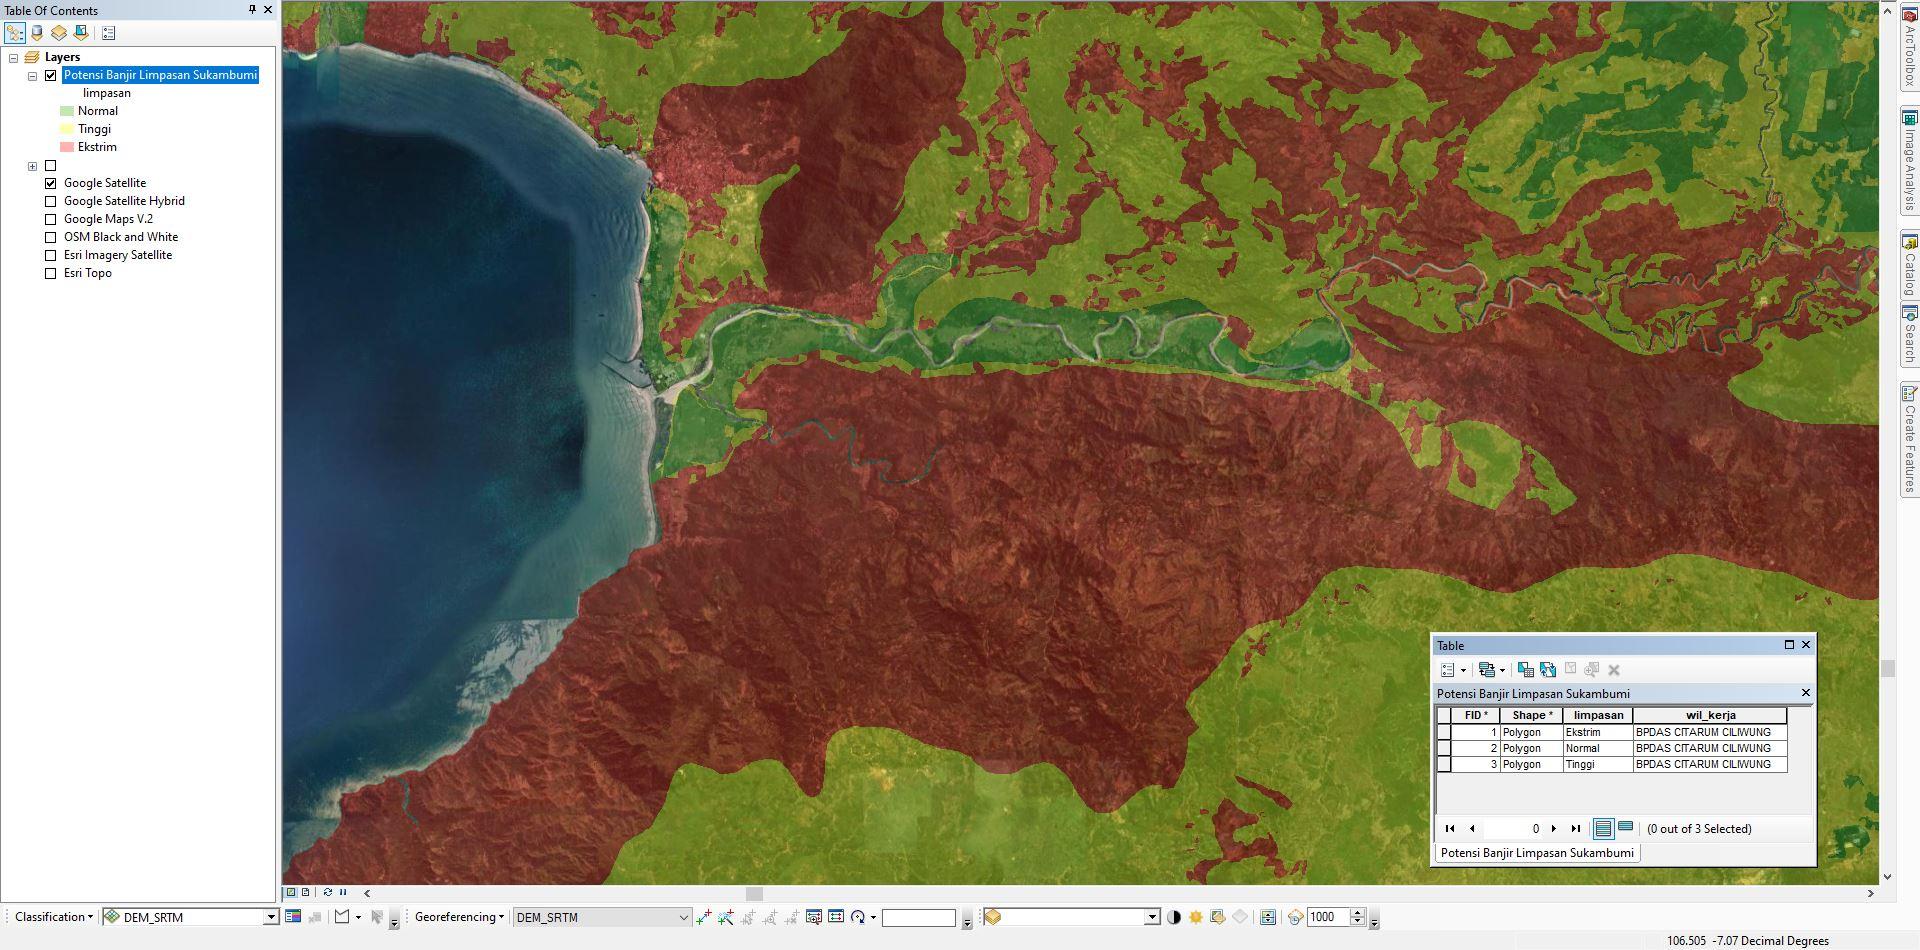 SHP Peta Potensi Banjir Limpasan